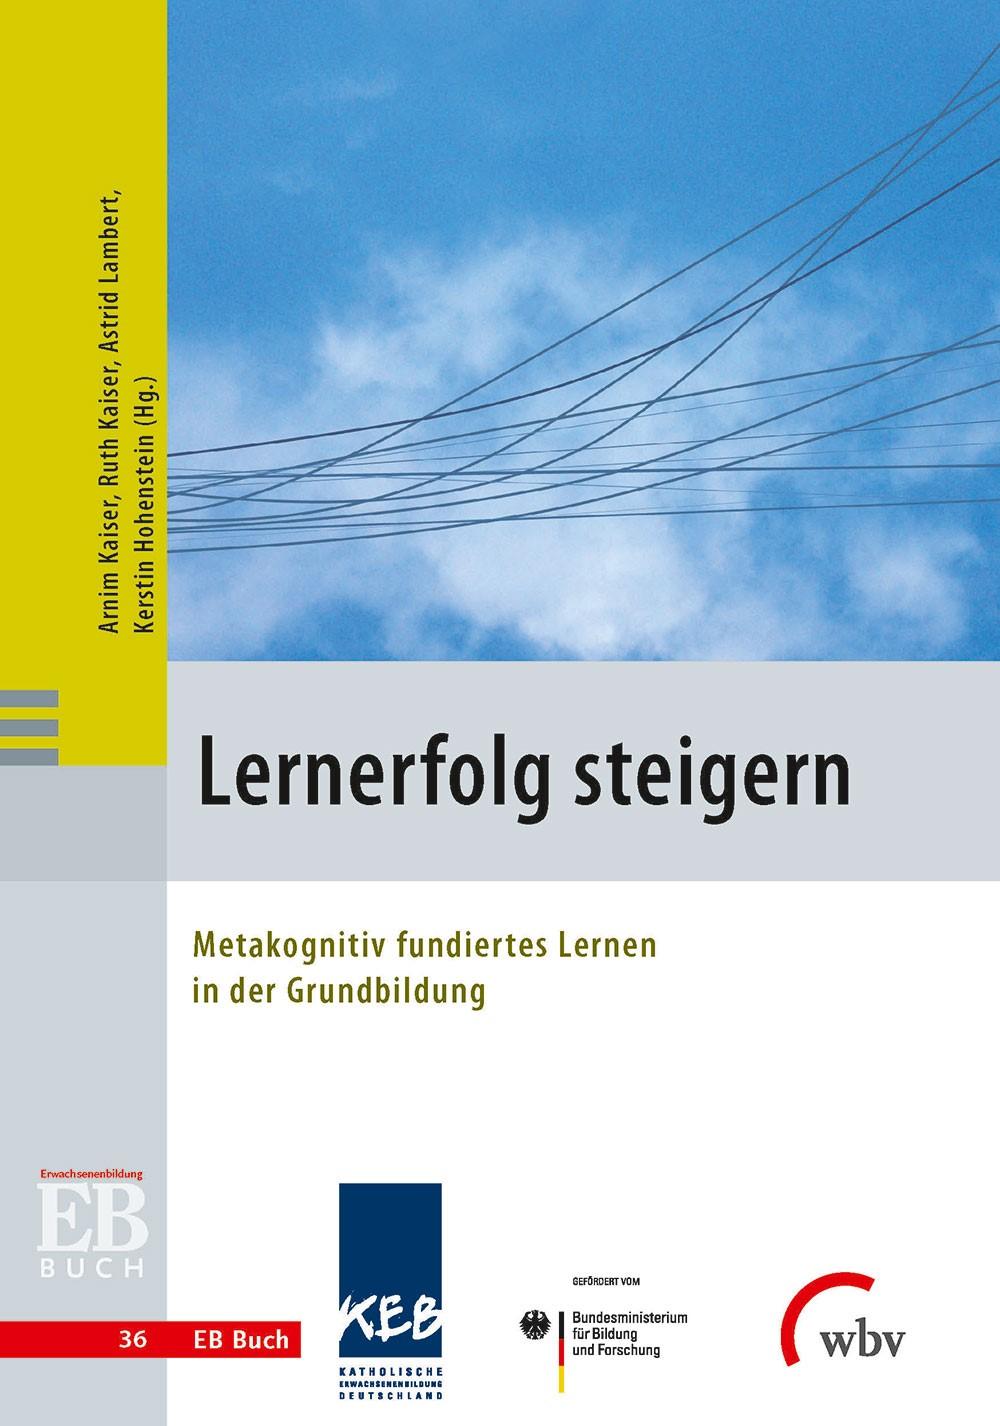 Lernerfolg steigern | Kaiser / Lambert / Hohenstein, 2015 | Buch (Cover)